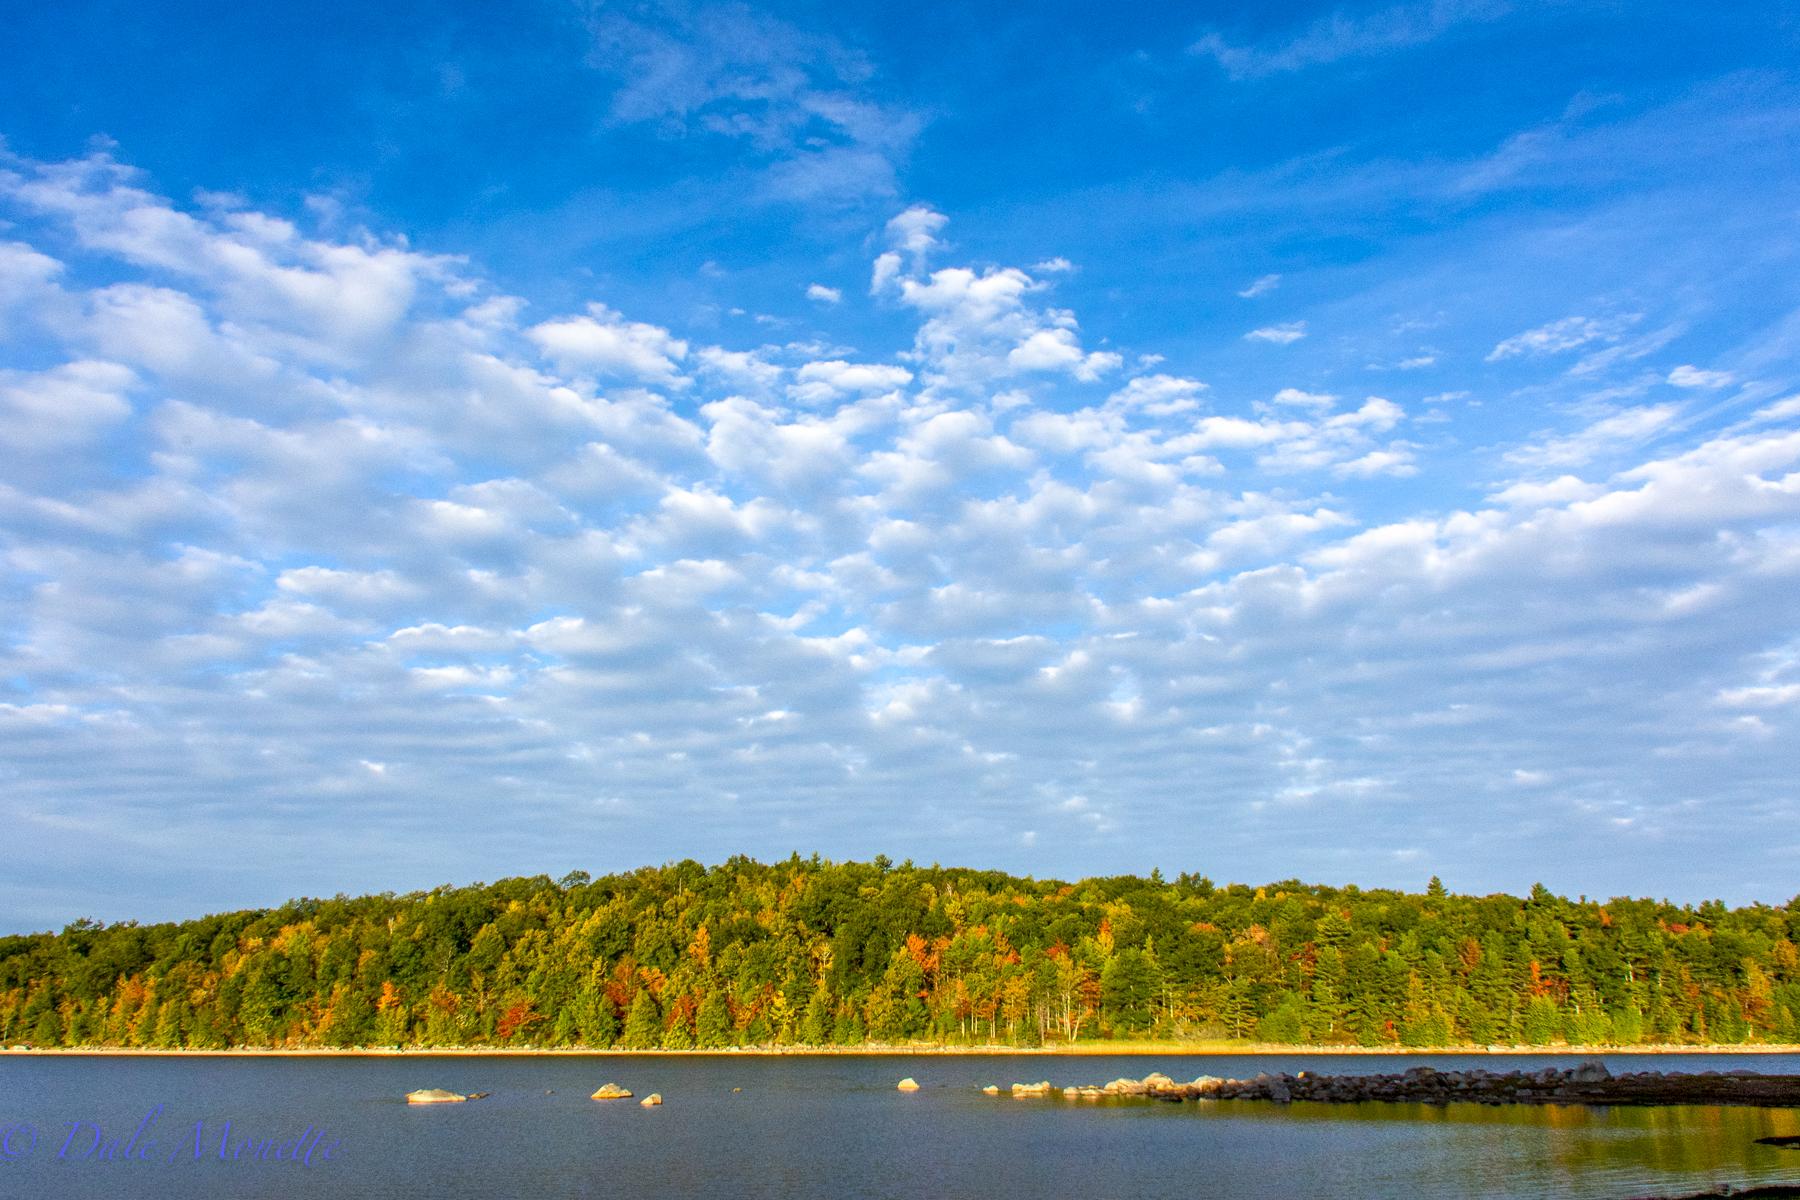 Early fall day at Quabbin, October 4th, 2015, Moore Island.